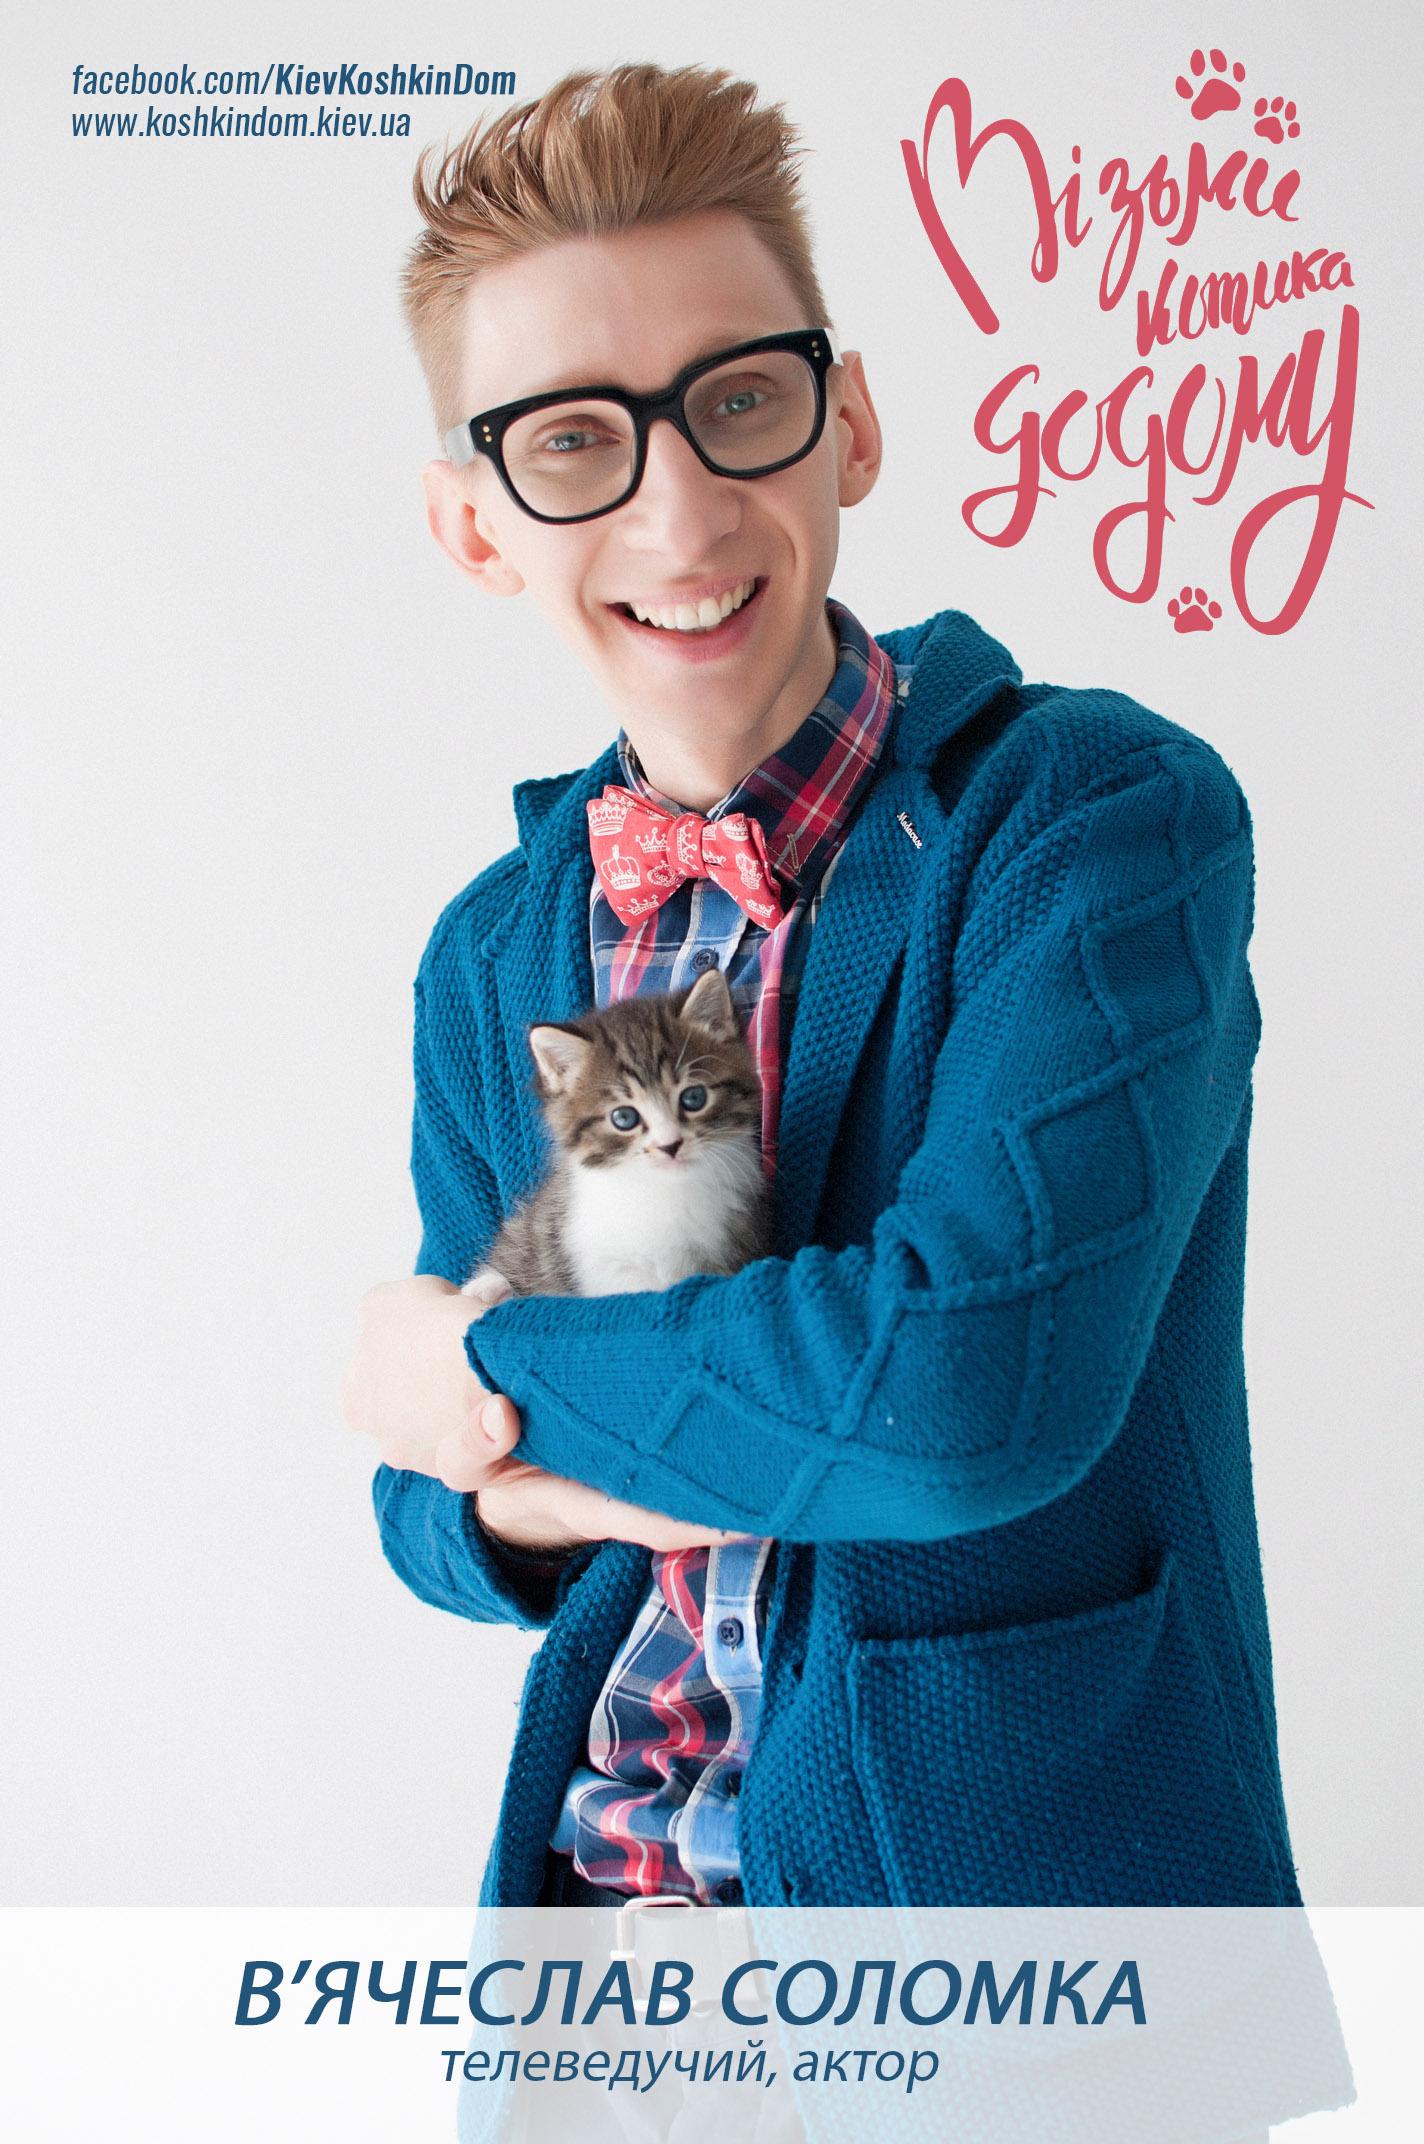 Слава Соломка с котом